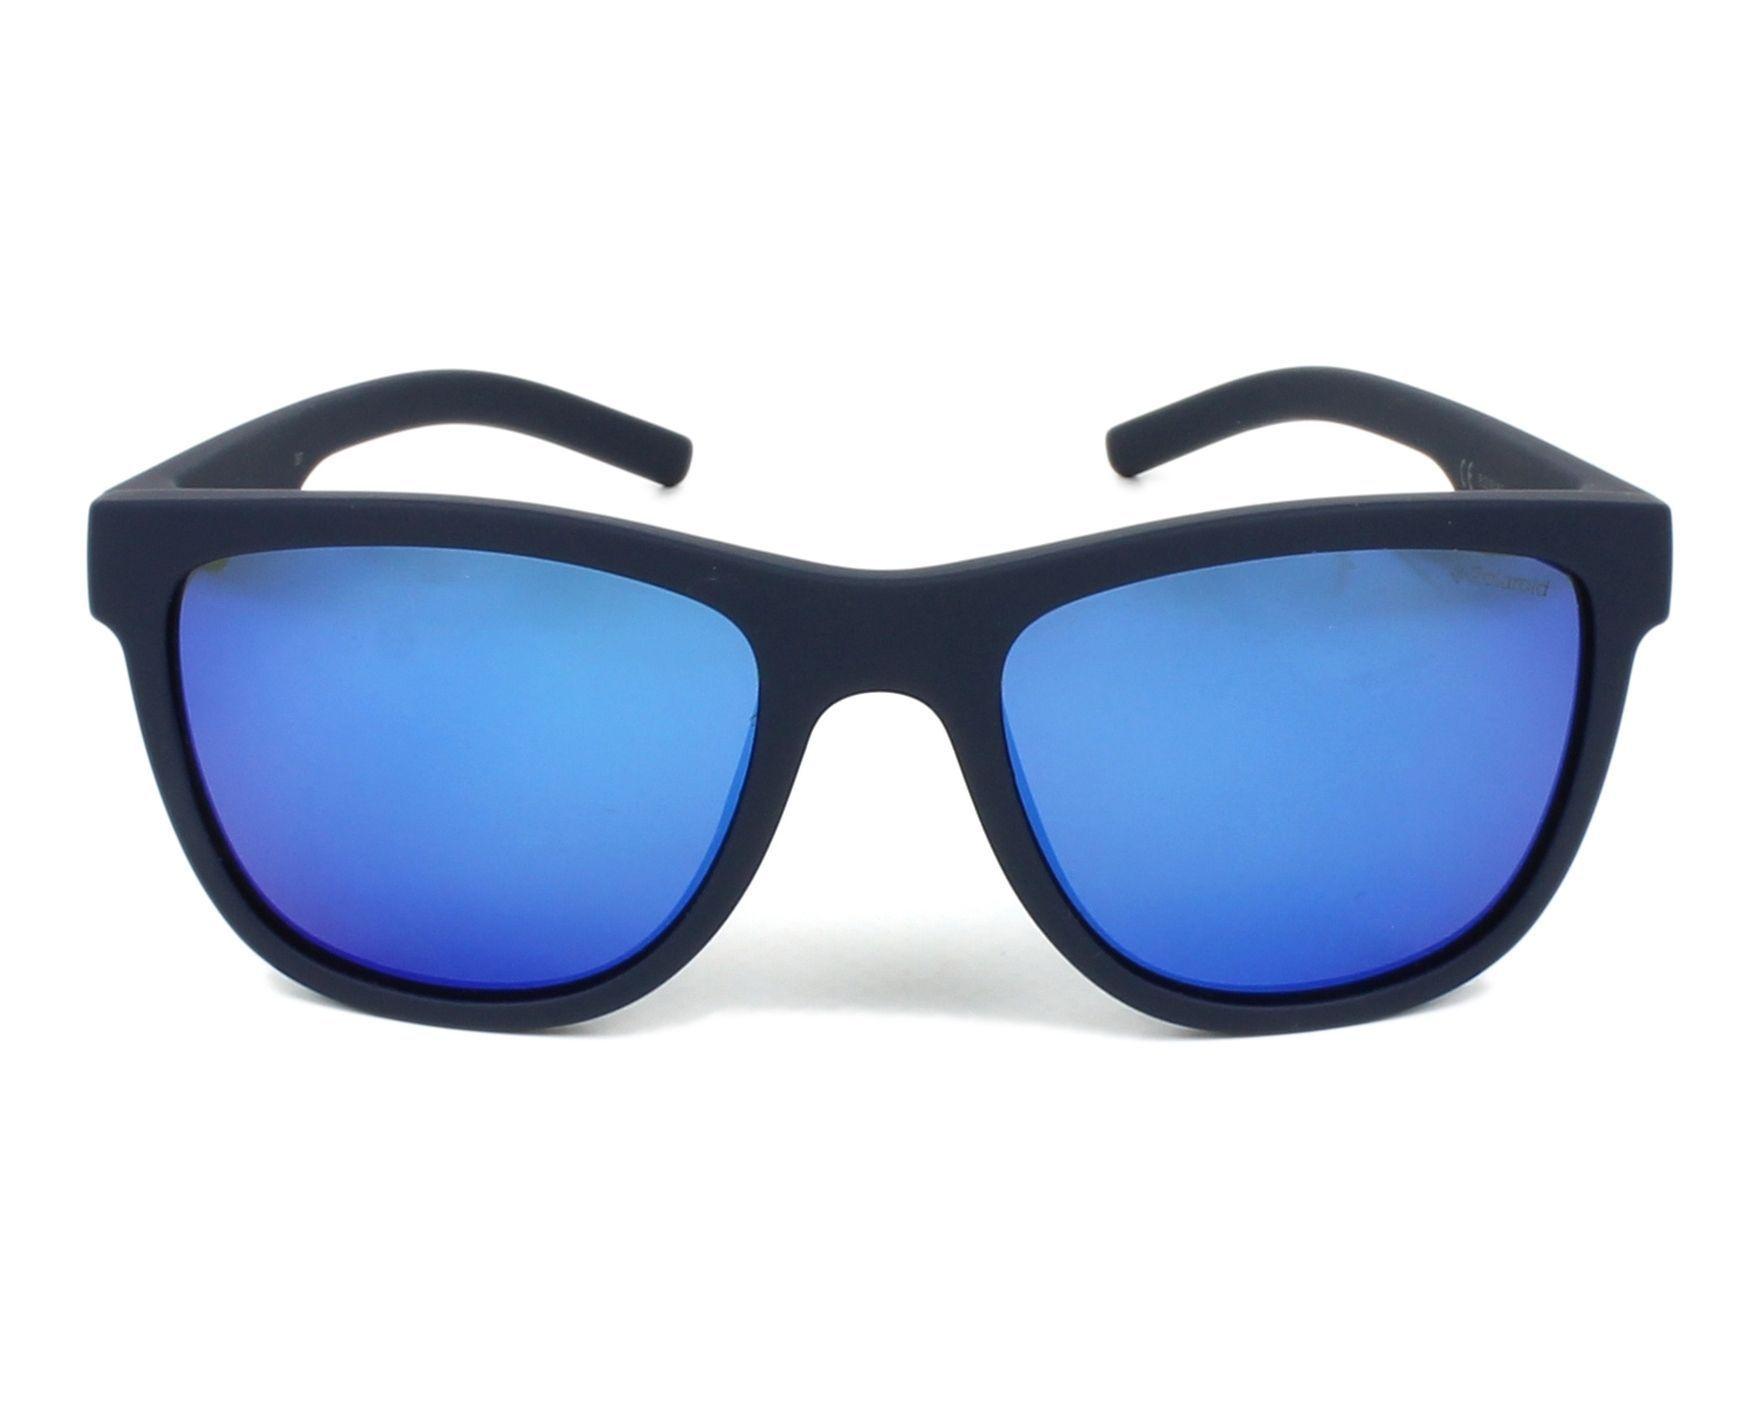 7dbdd84ee Óculos de Sol Infantil Polaroid Pld8018/S CIWJY - Omega Ótica e ...